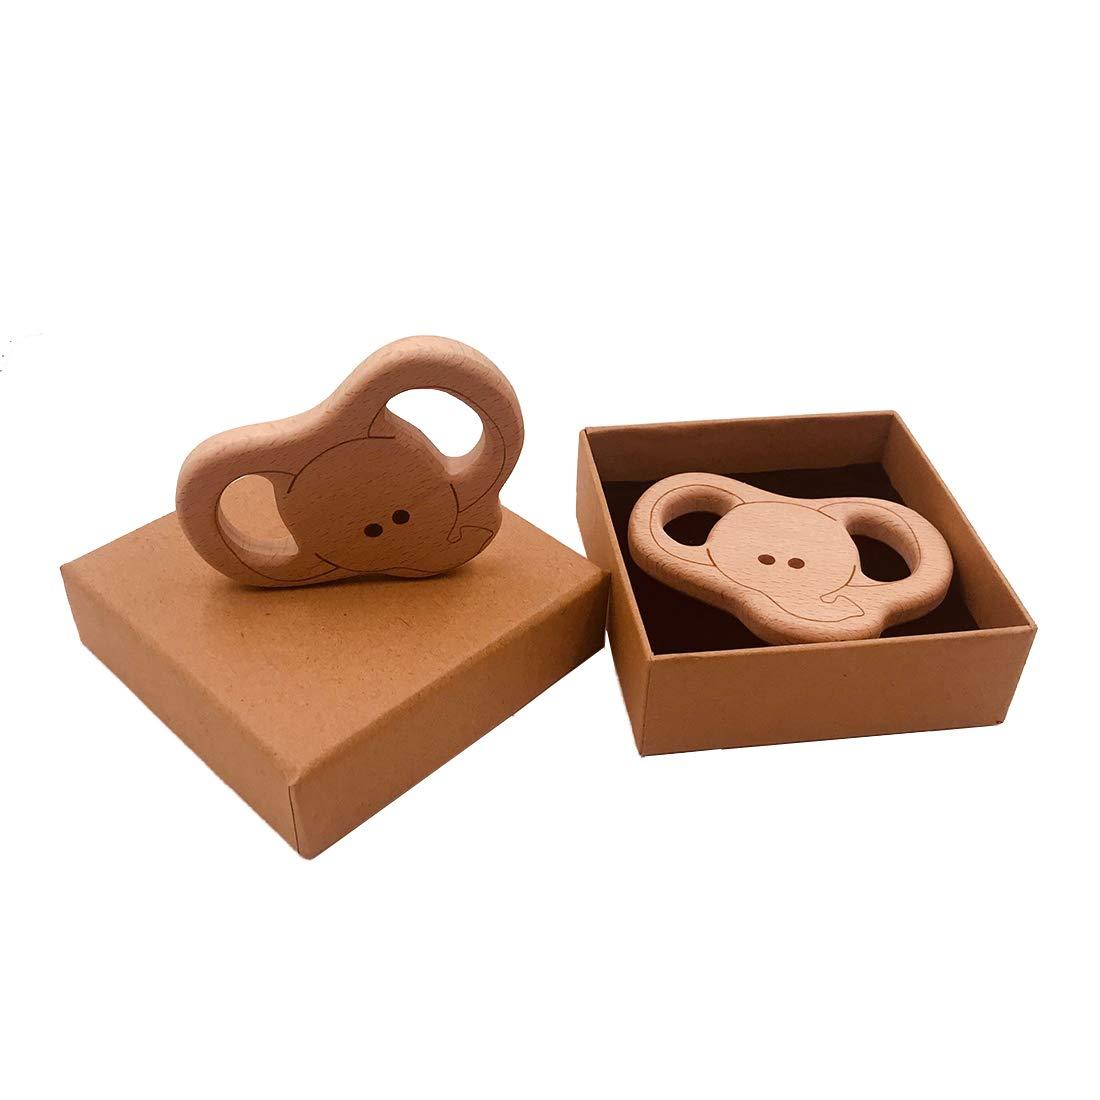 12pcs Coskiss 12pcs DIY Haya Animal Mordedor de madera personalizable beb/é Mordedor dentici/ón collar libre de BPA de grado alimenticio Mordedor colgantes